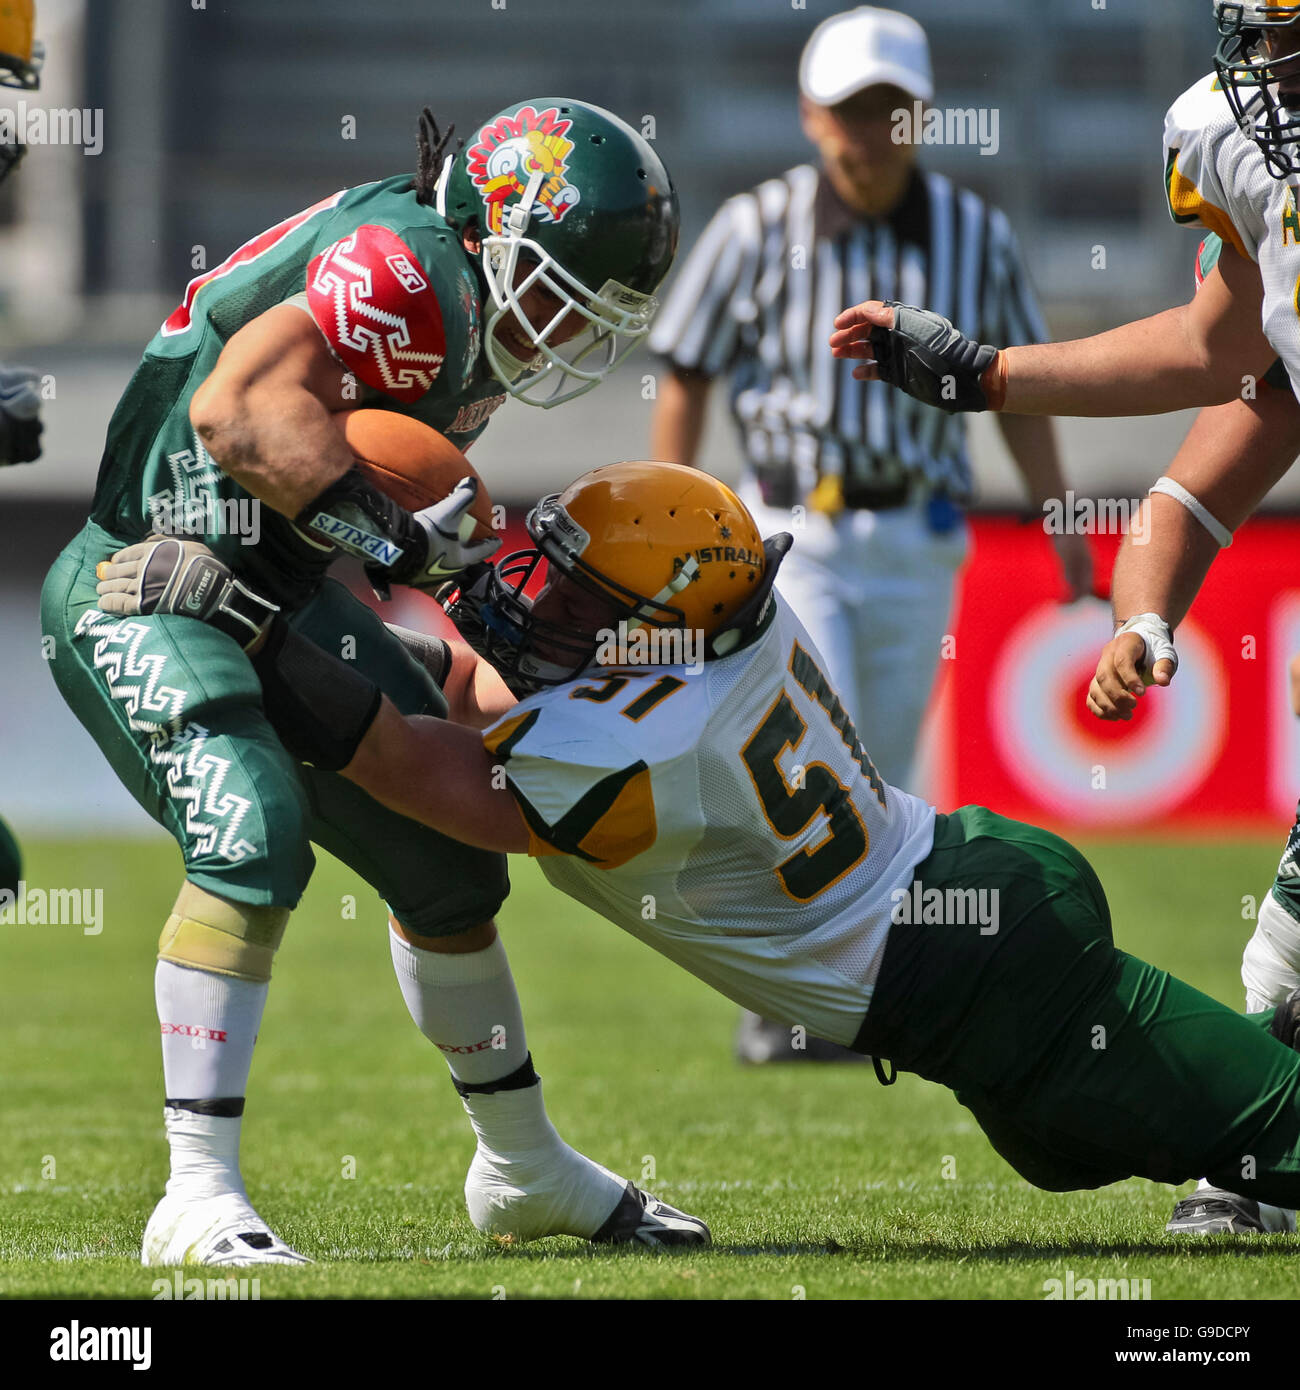 Jonathan Barrera, #23 Mexico, is tackled by Layke Rossiello, #51 Australia, at the Football World Championship on - Stock Image